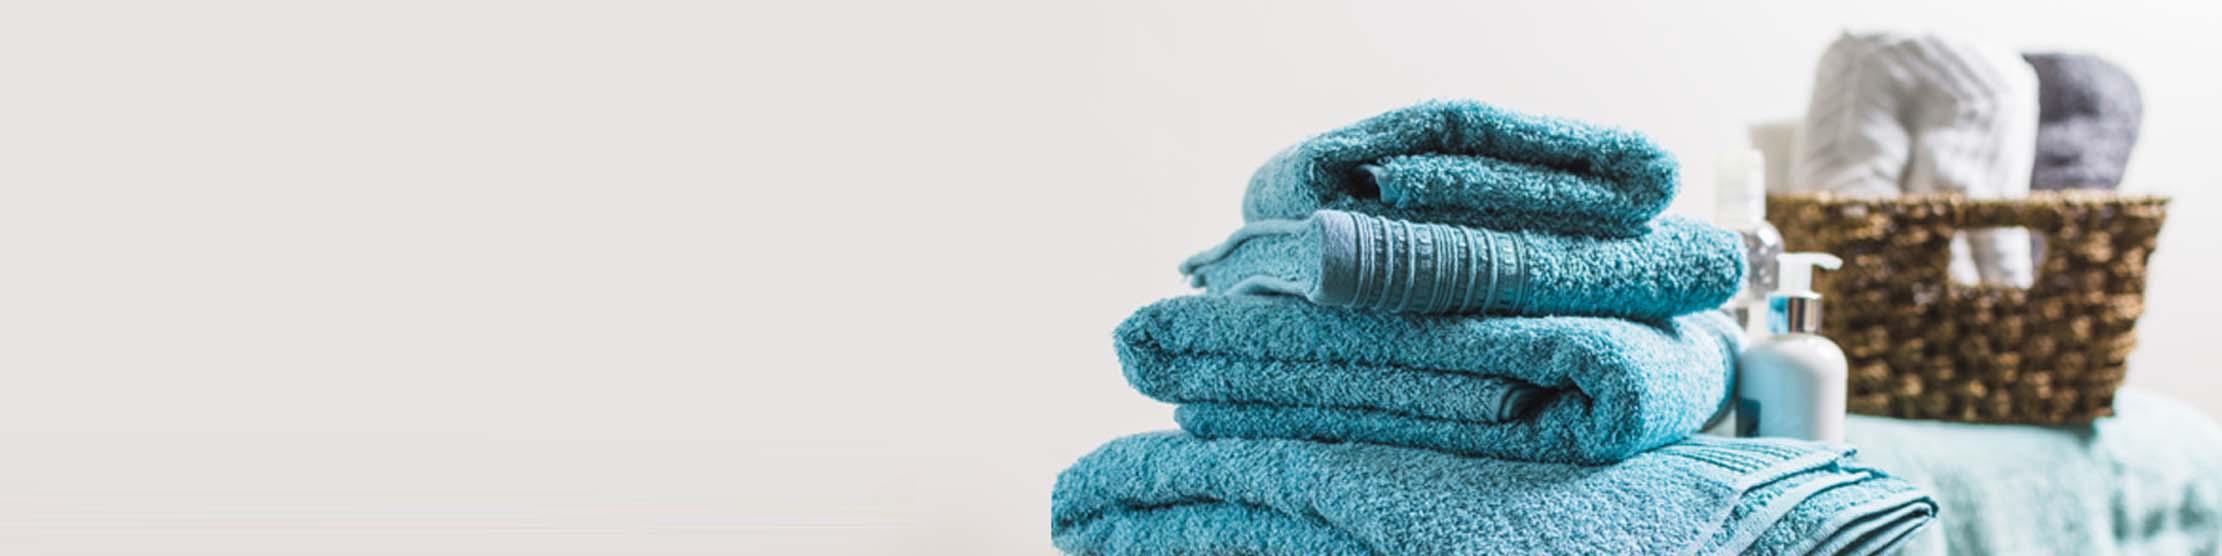 wholesale private label towel